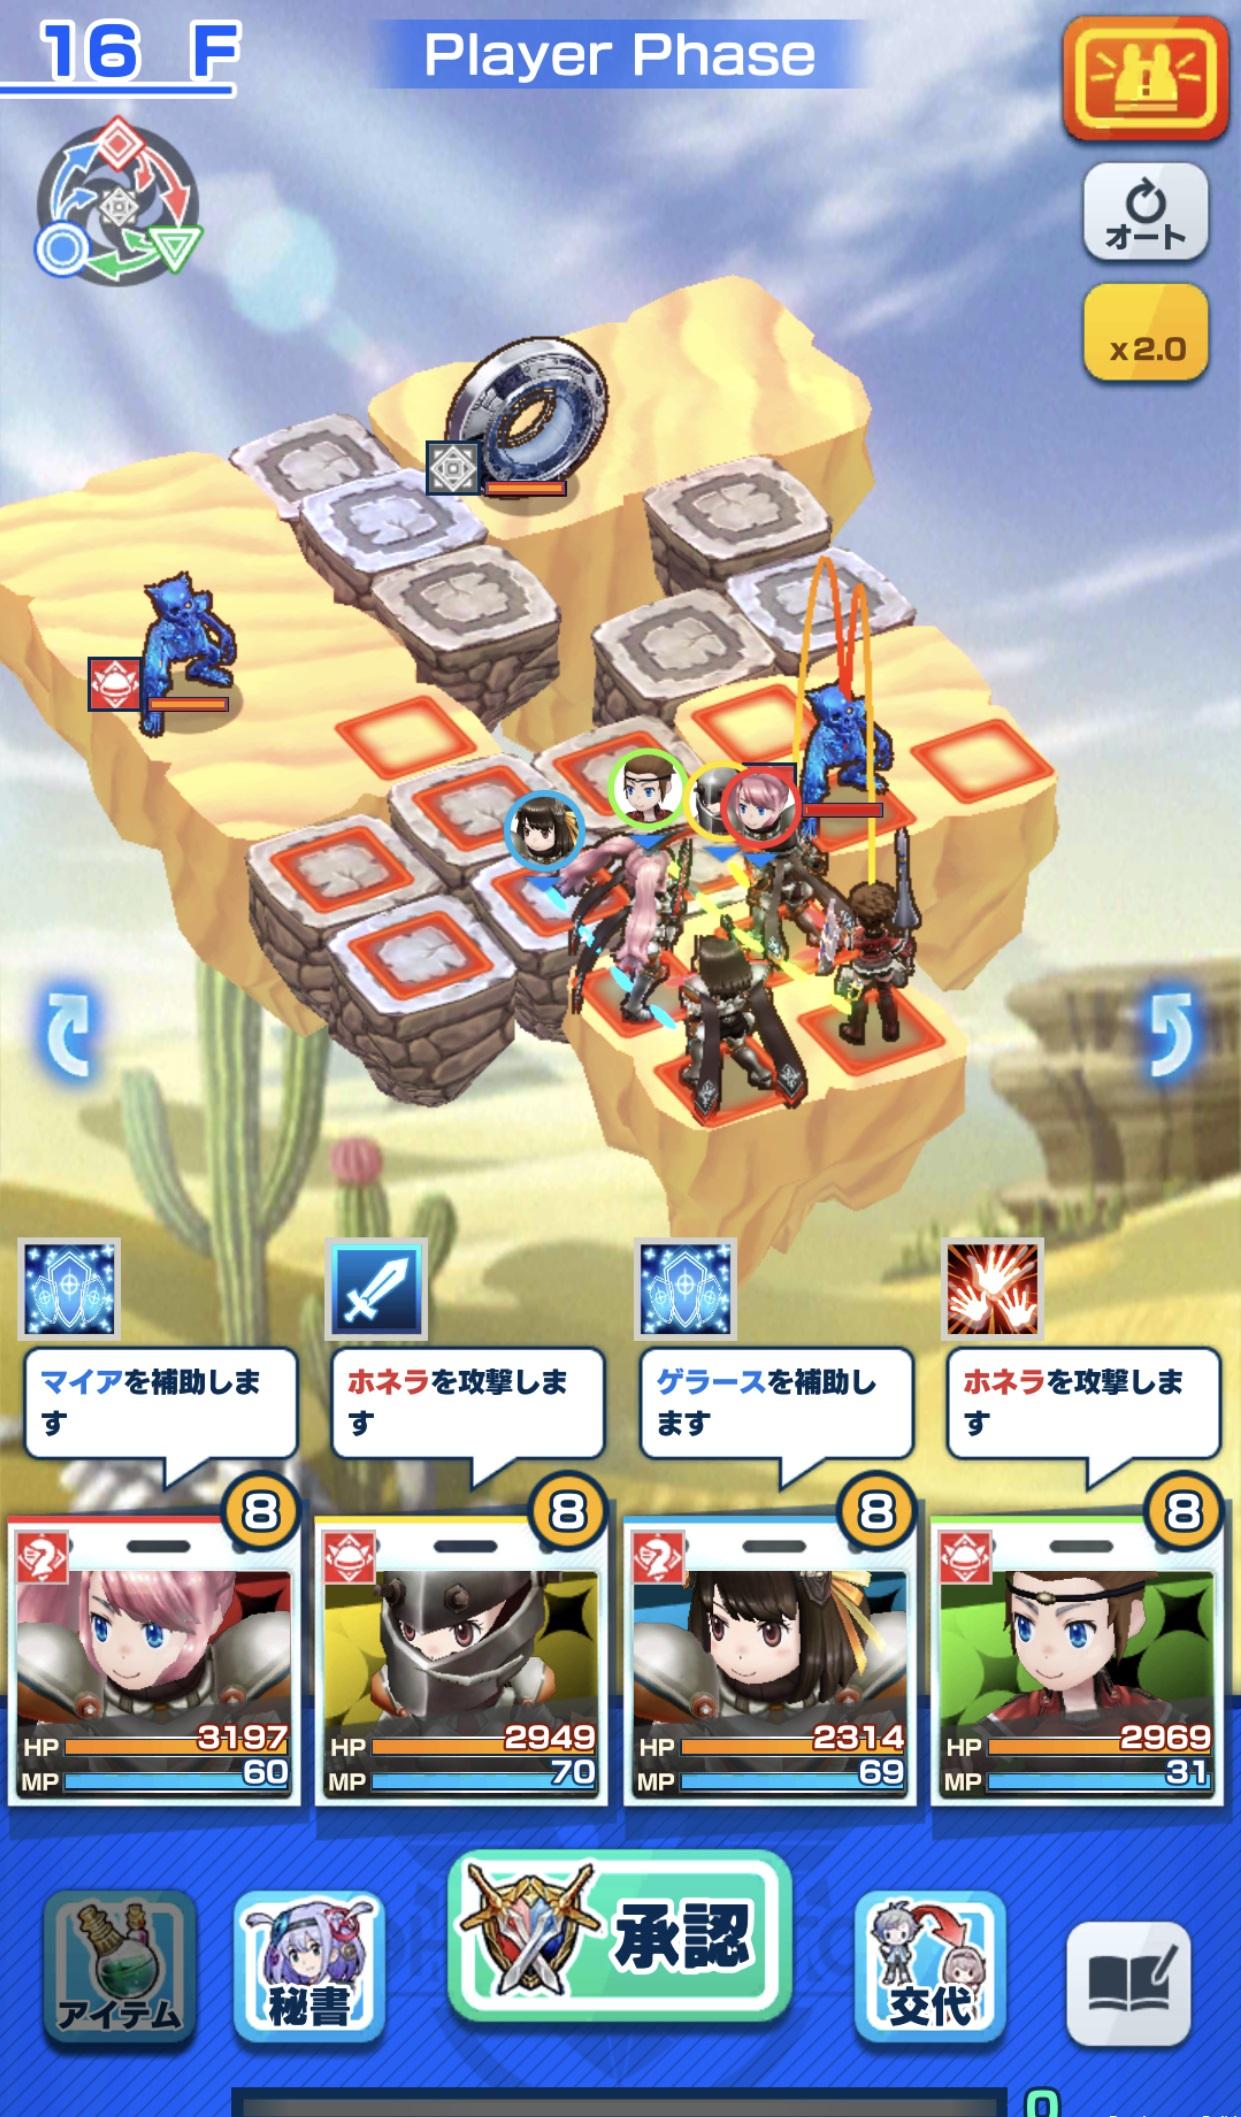 /theme/dengekionline/shachibato/images/kouryaku/002